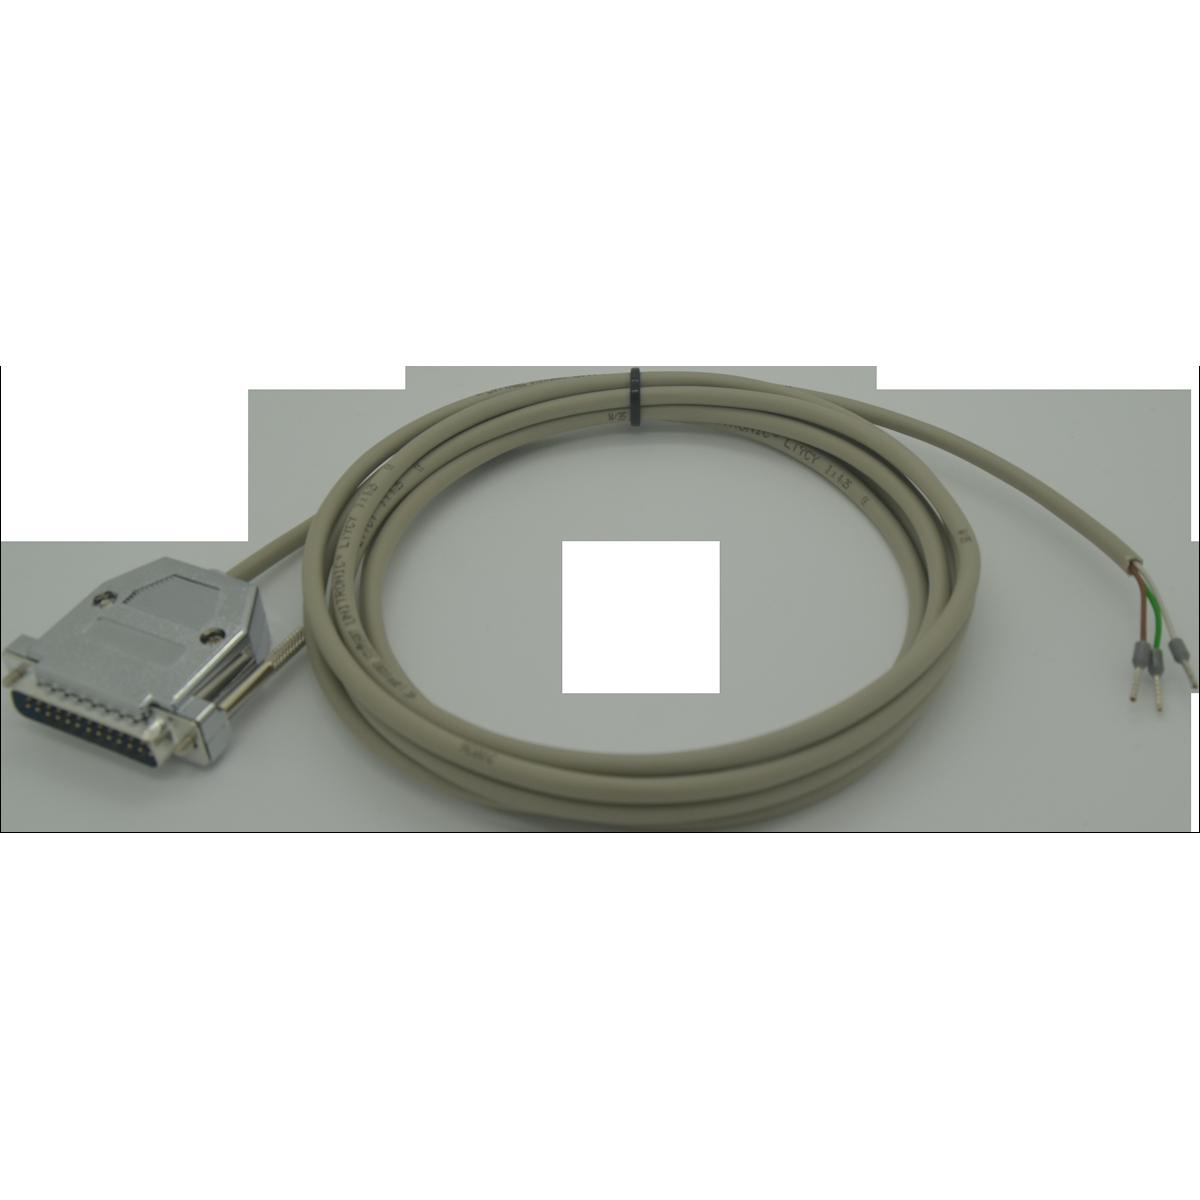 Printer Cable DB25 Male, 3 meter